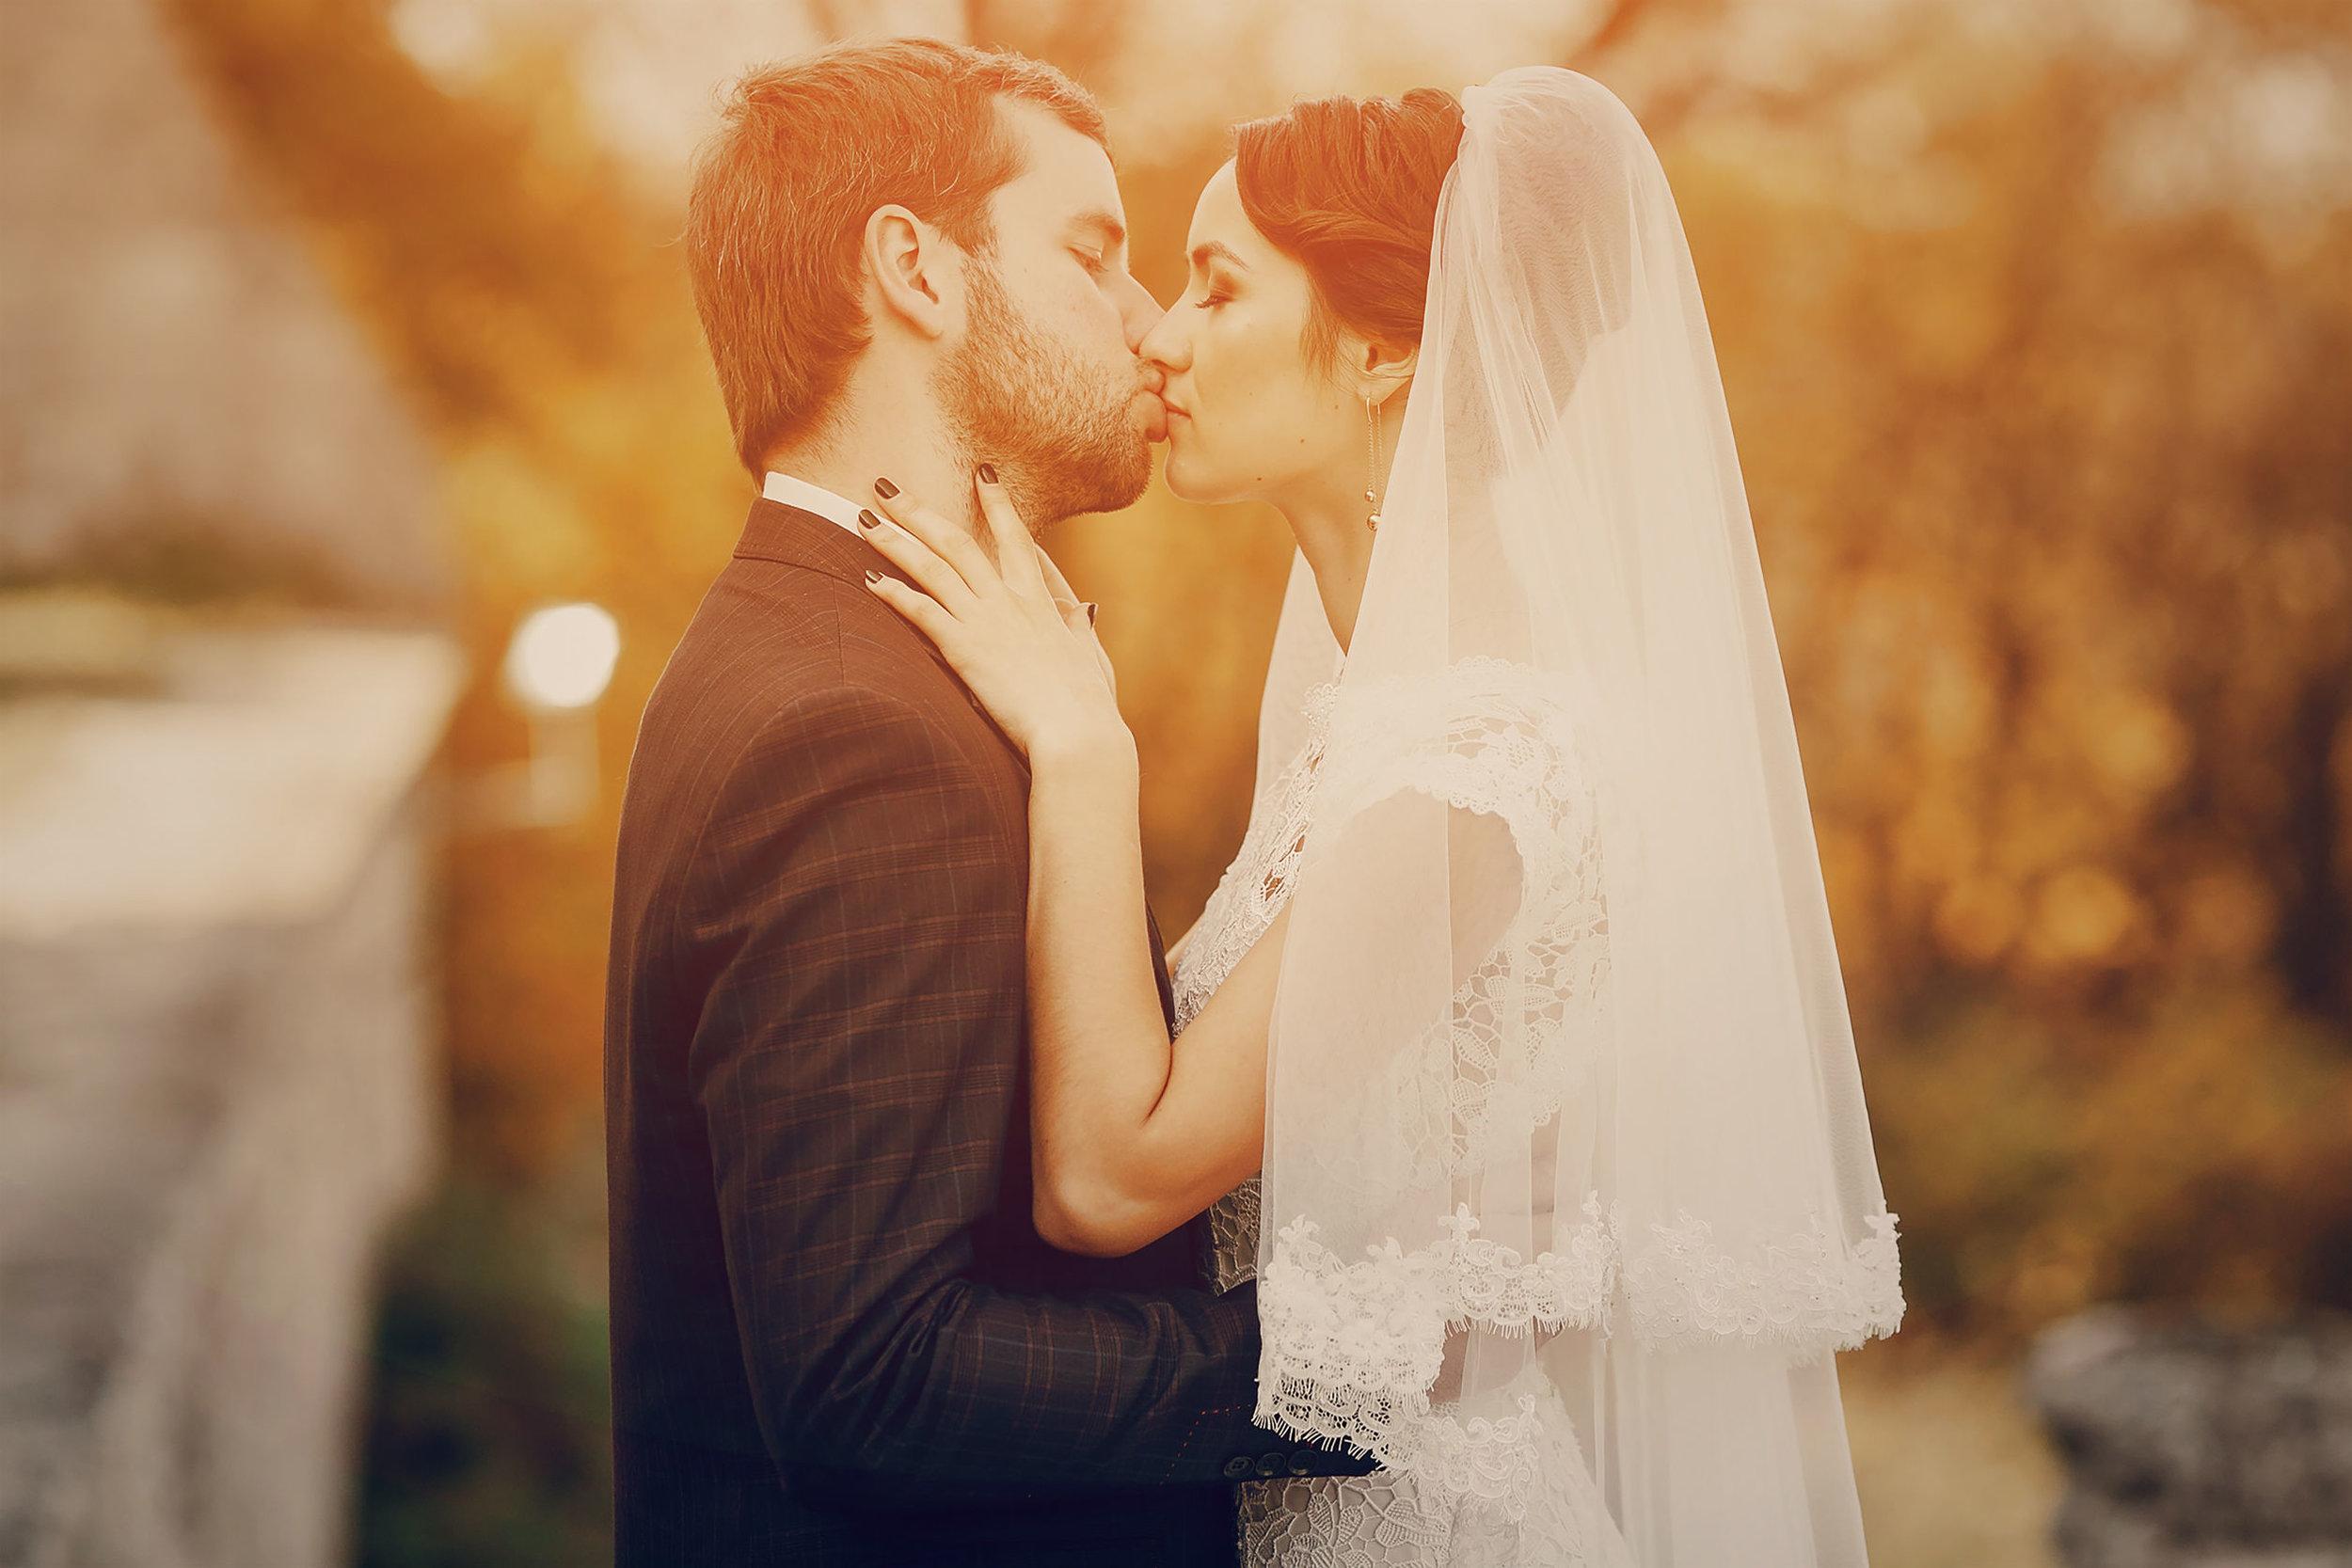 45258244 - happy couple whose wedding photo shoot in a golden autumn